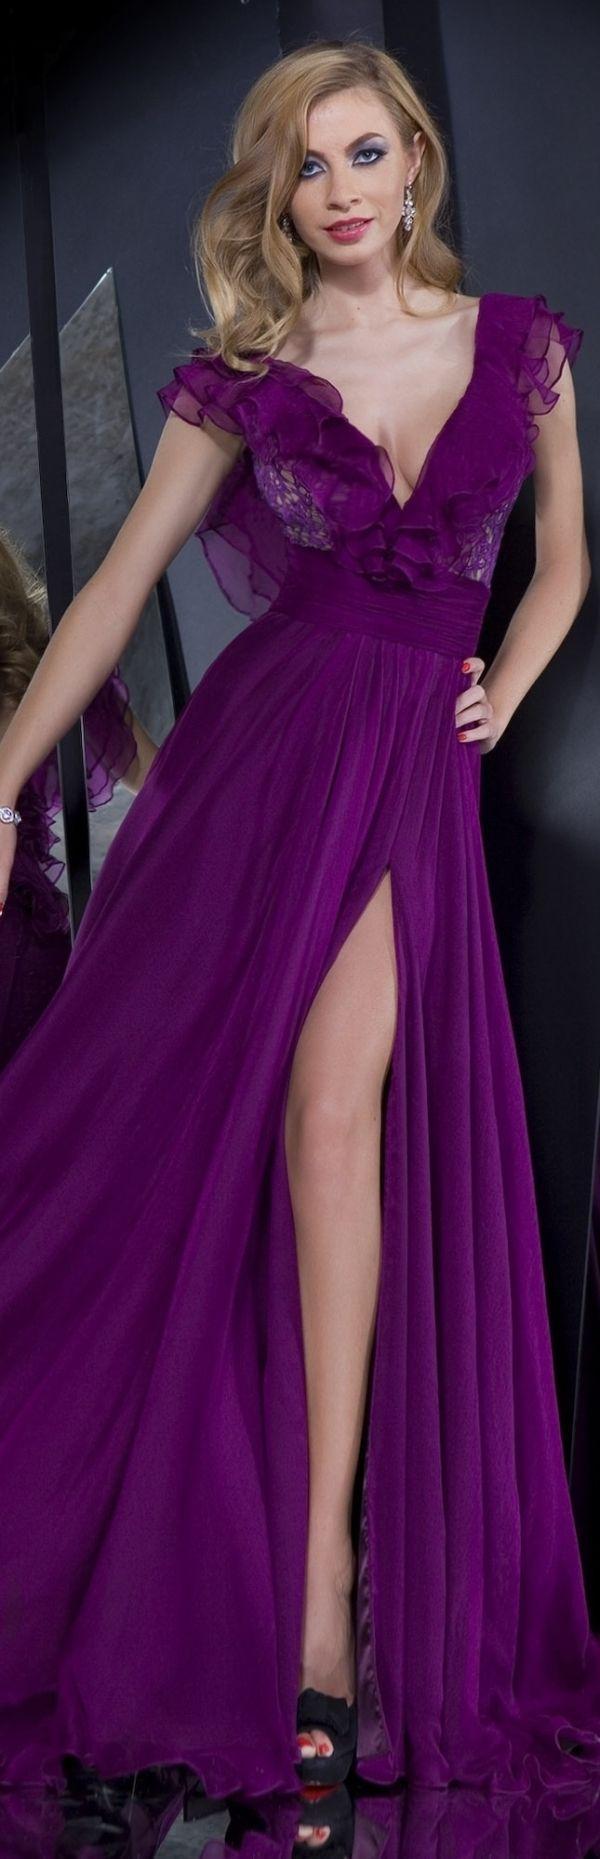 زفاف - Gowns........Purple Passions